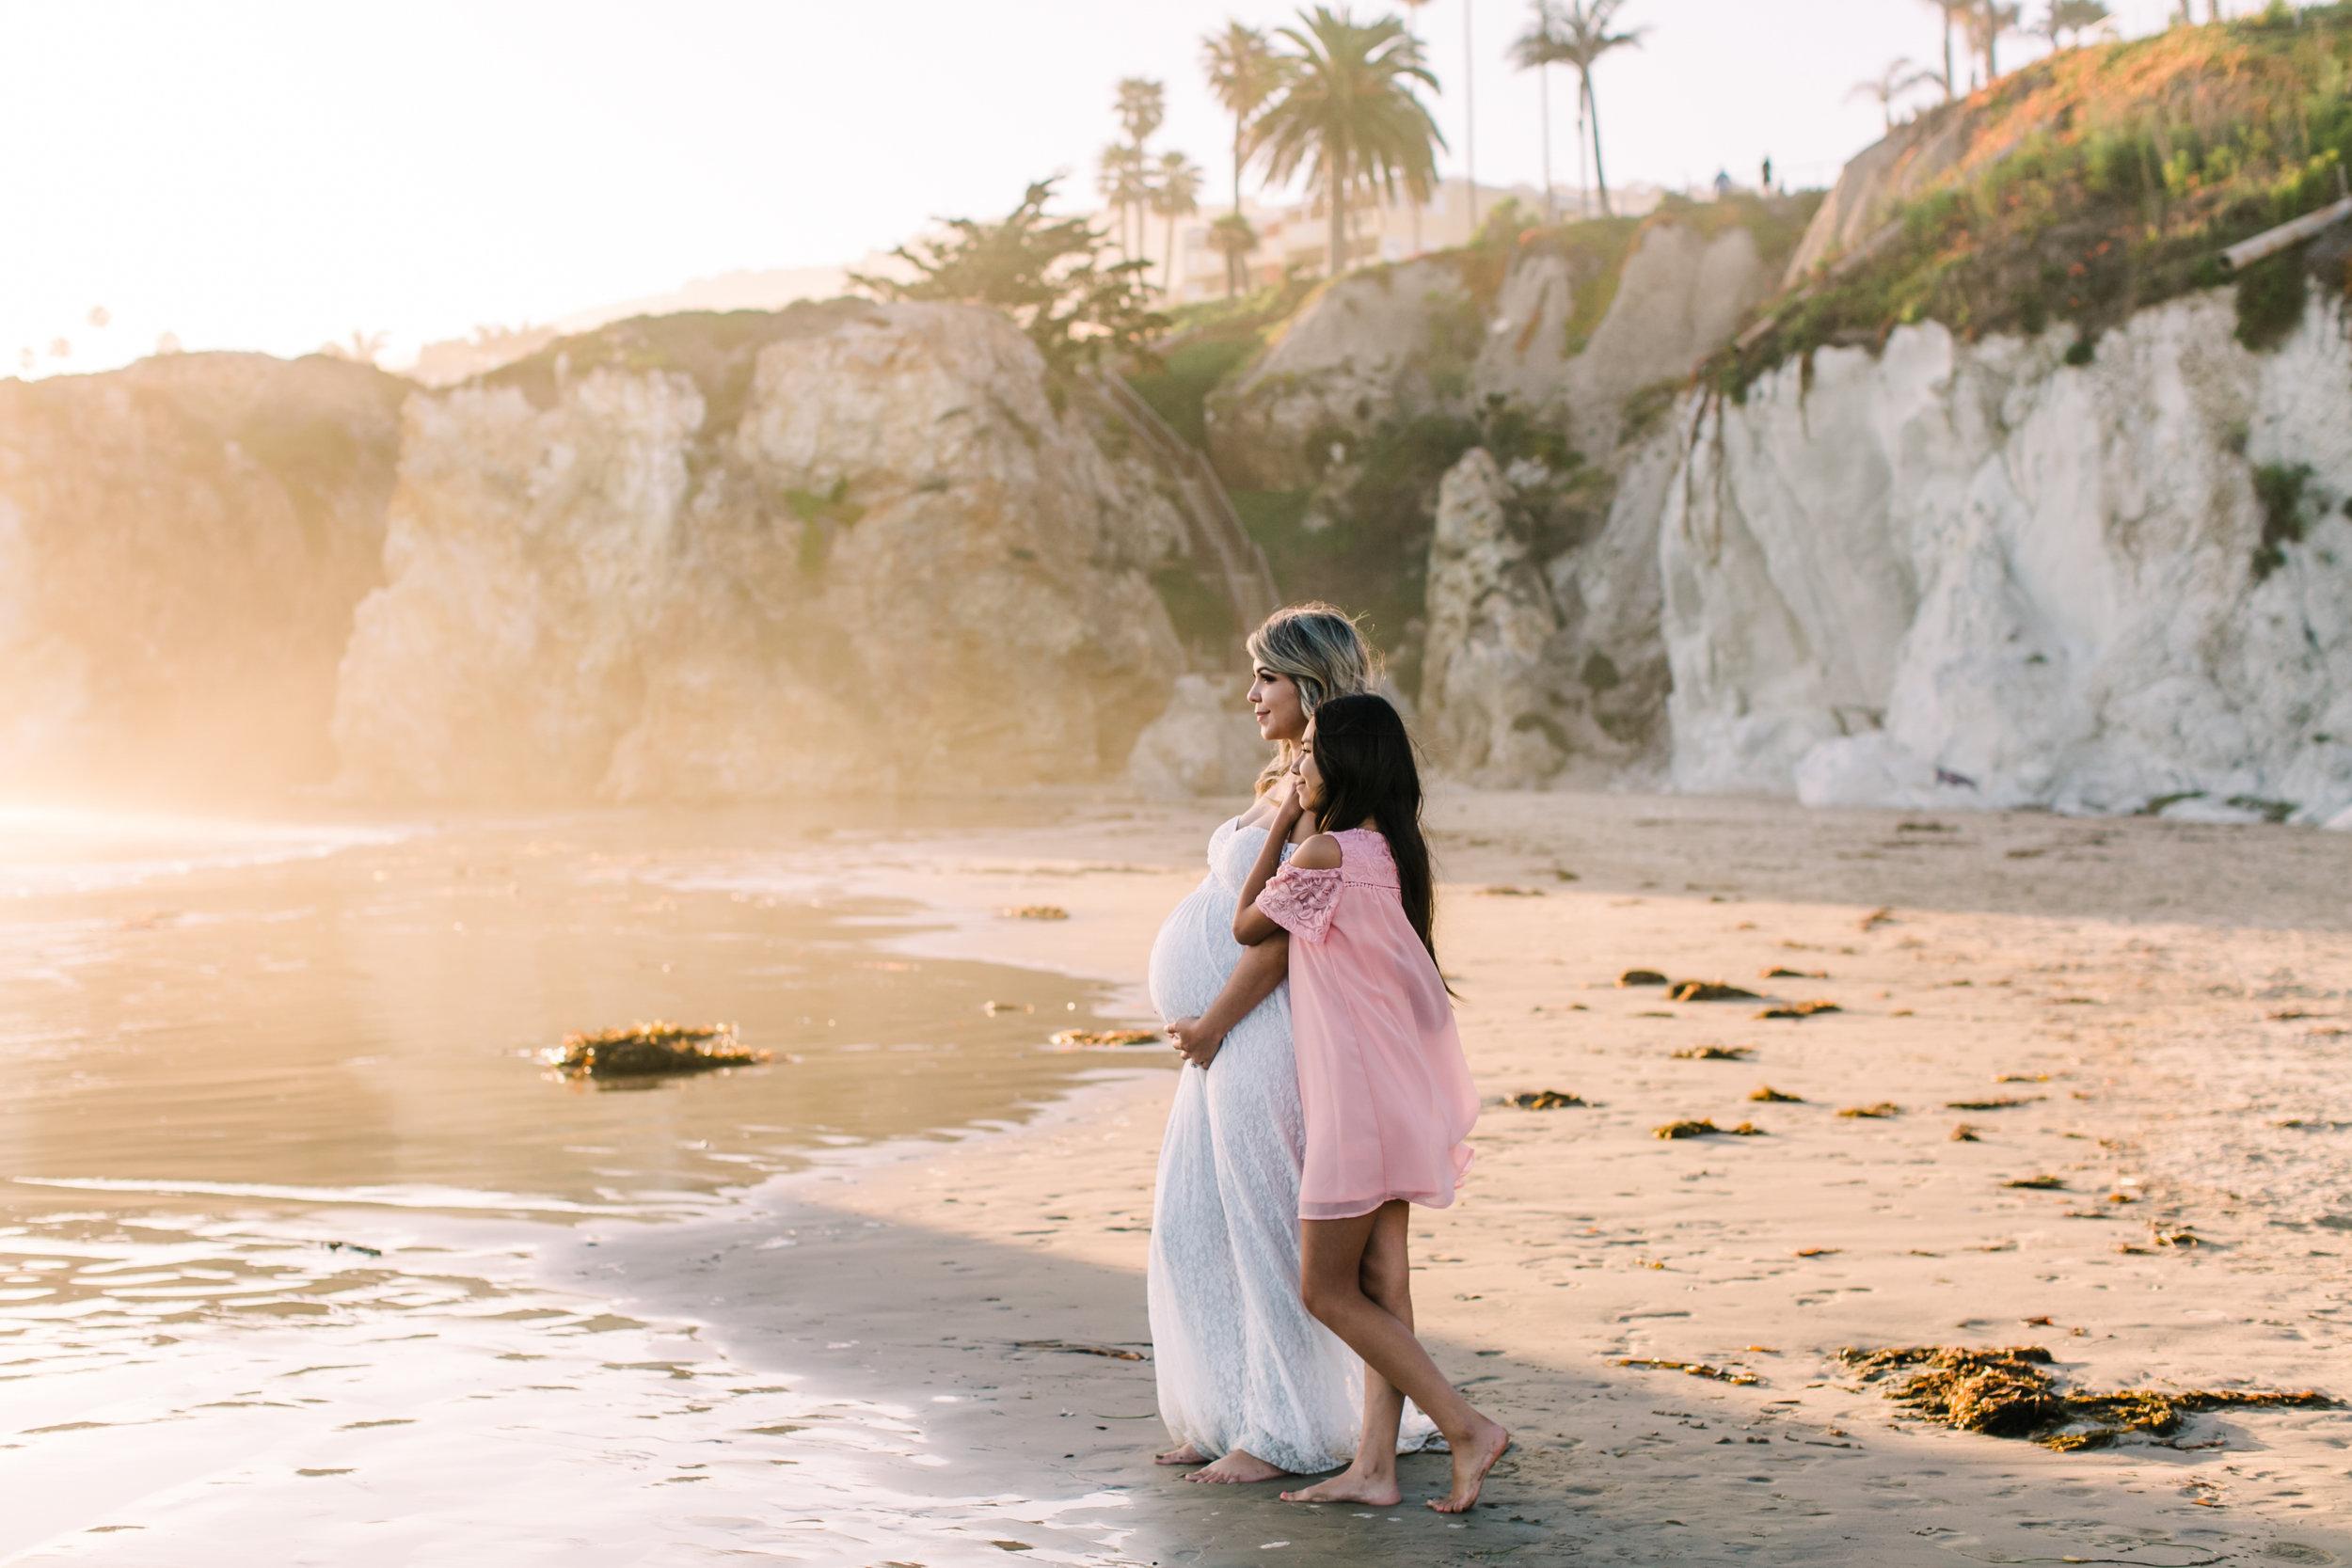 alabama-sunset-romantic-maternity-photos (39 of 40).jpg